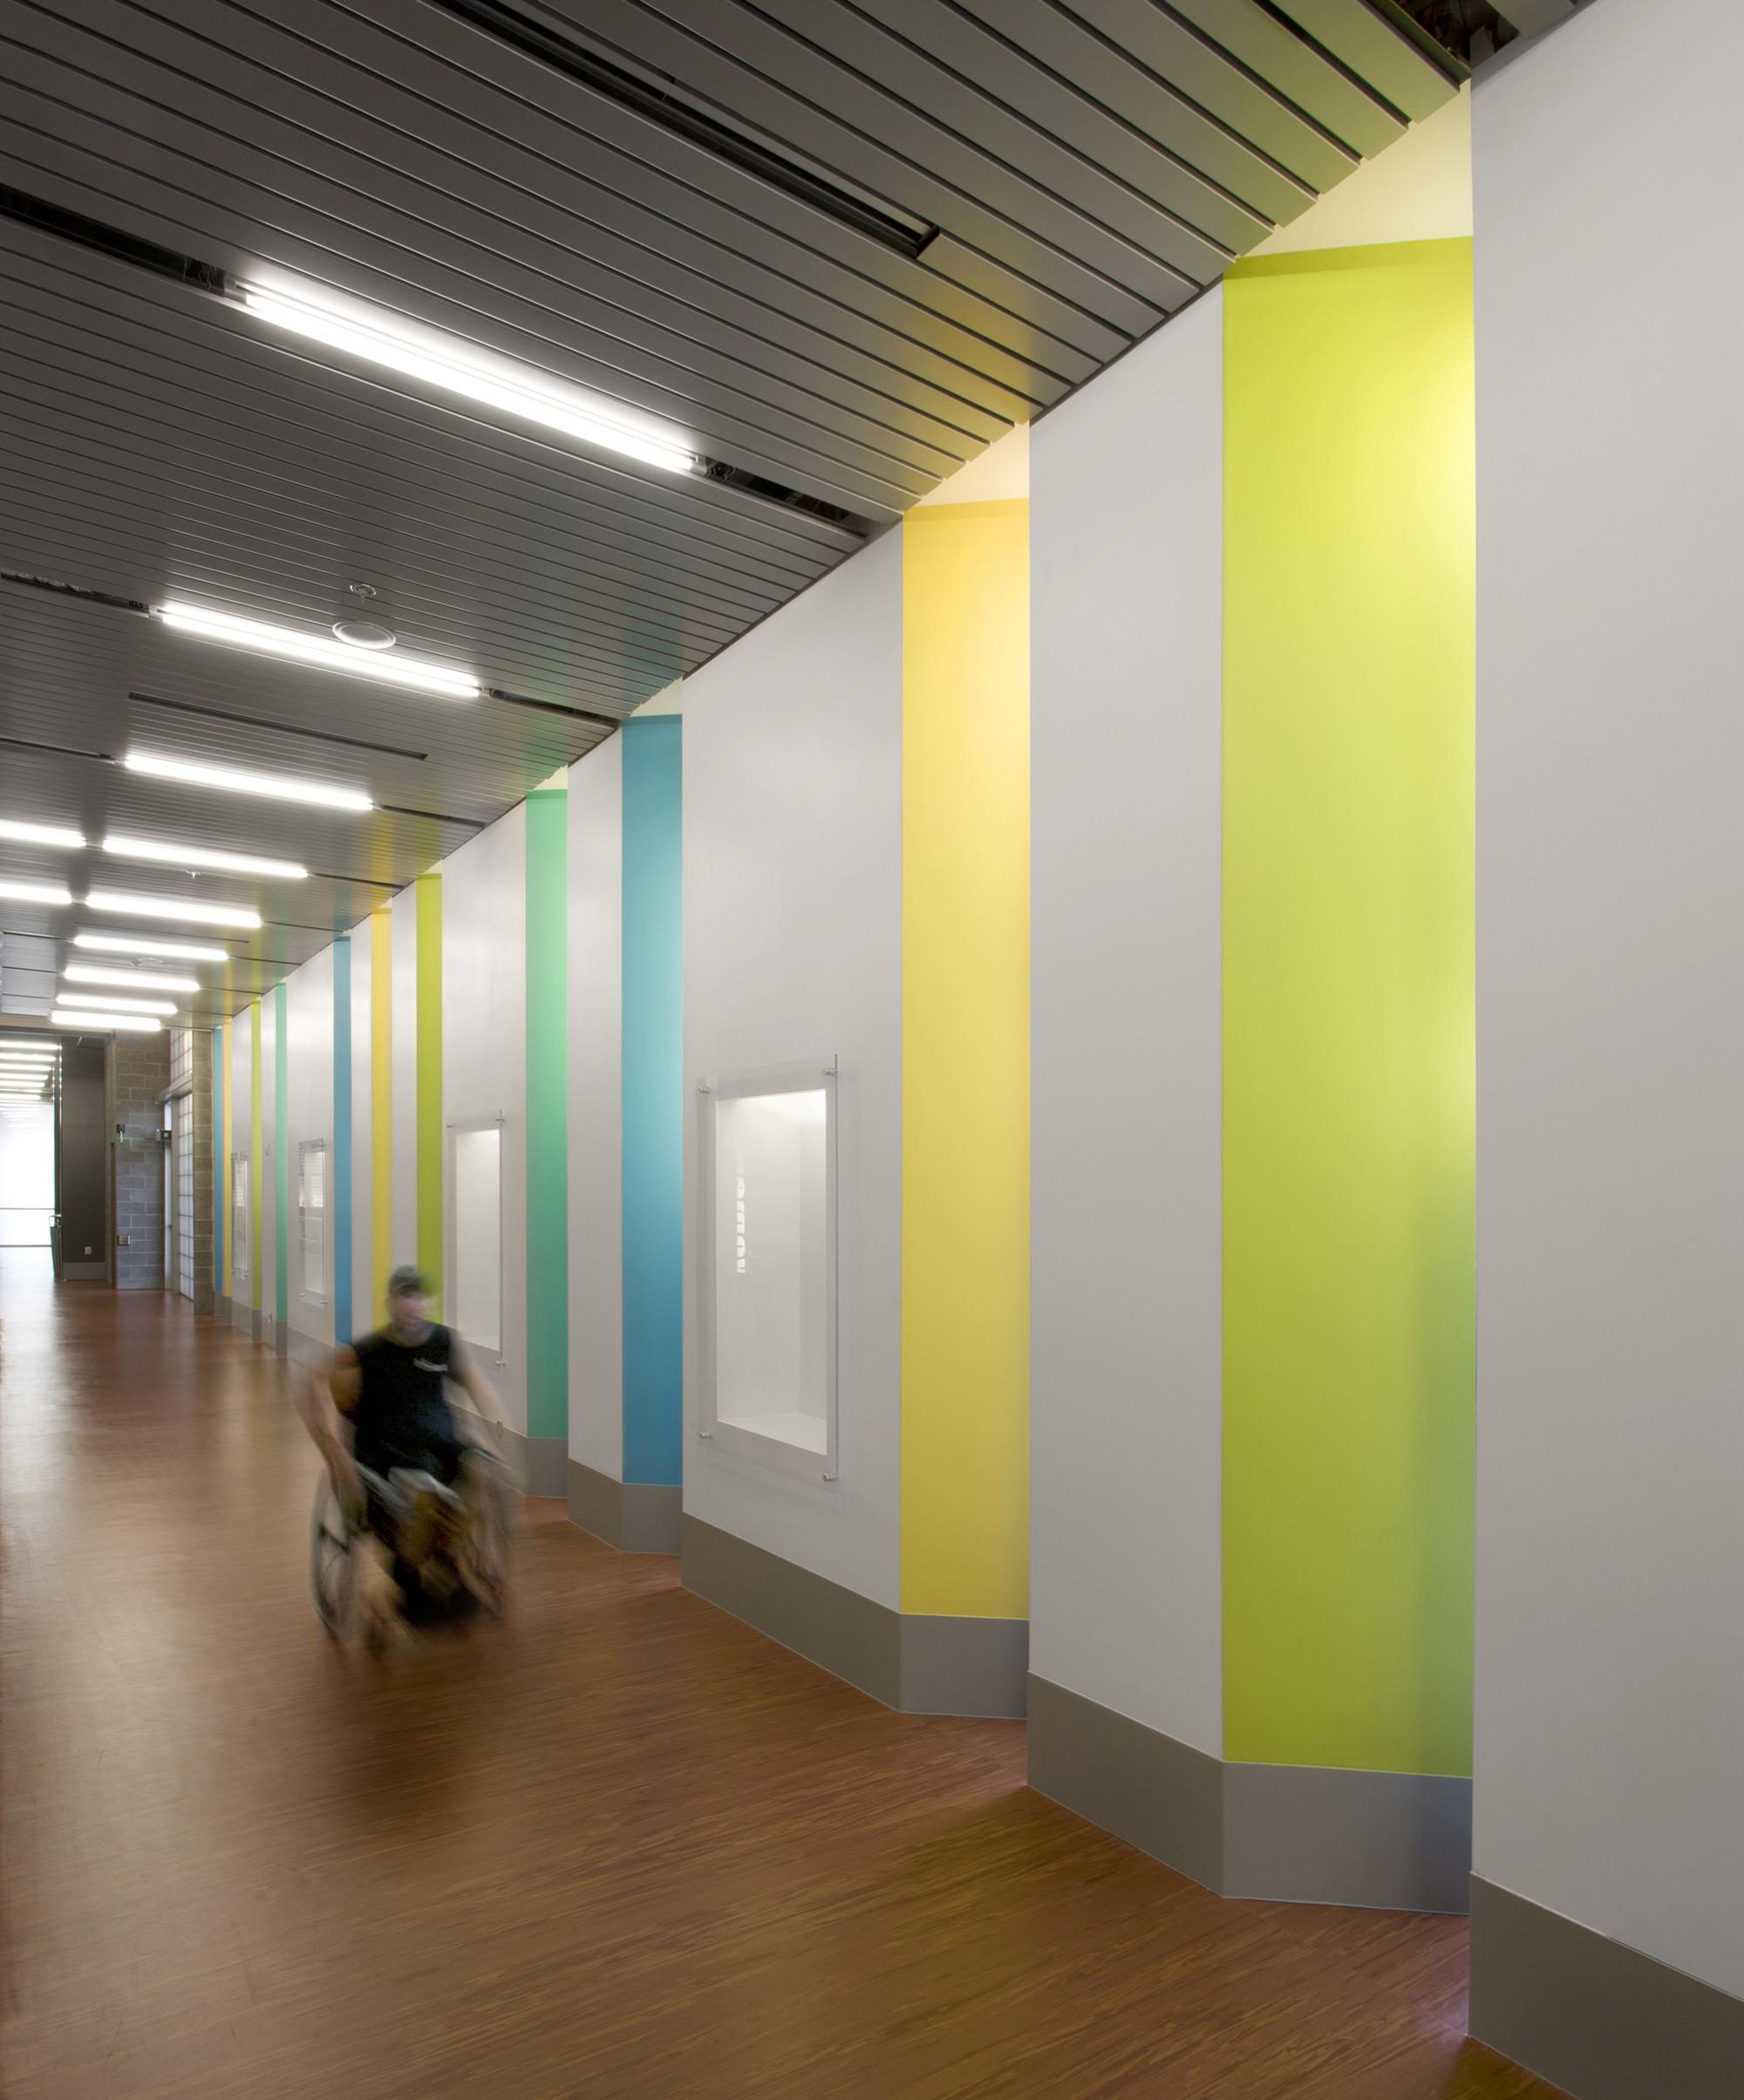 Дизайн спортивного комплекса: коридор с яркими элементами